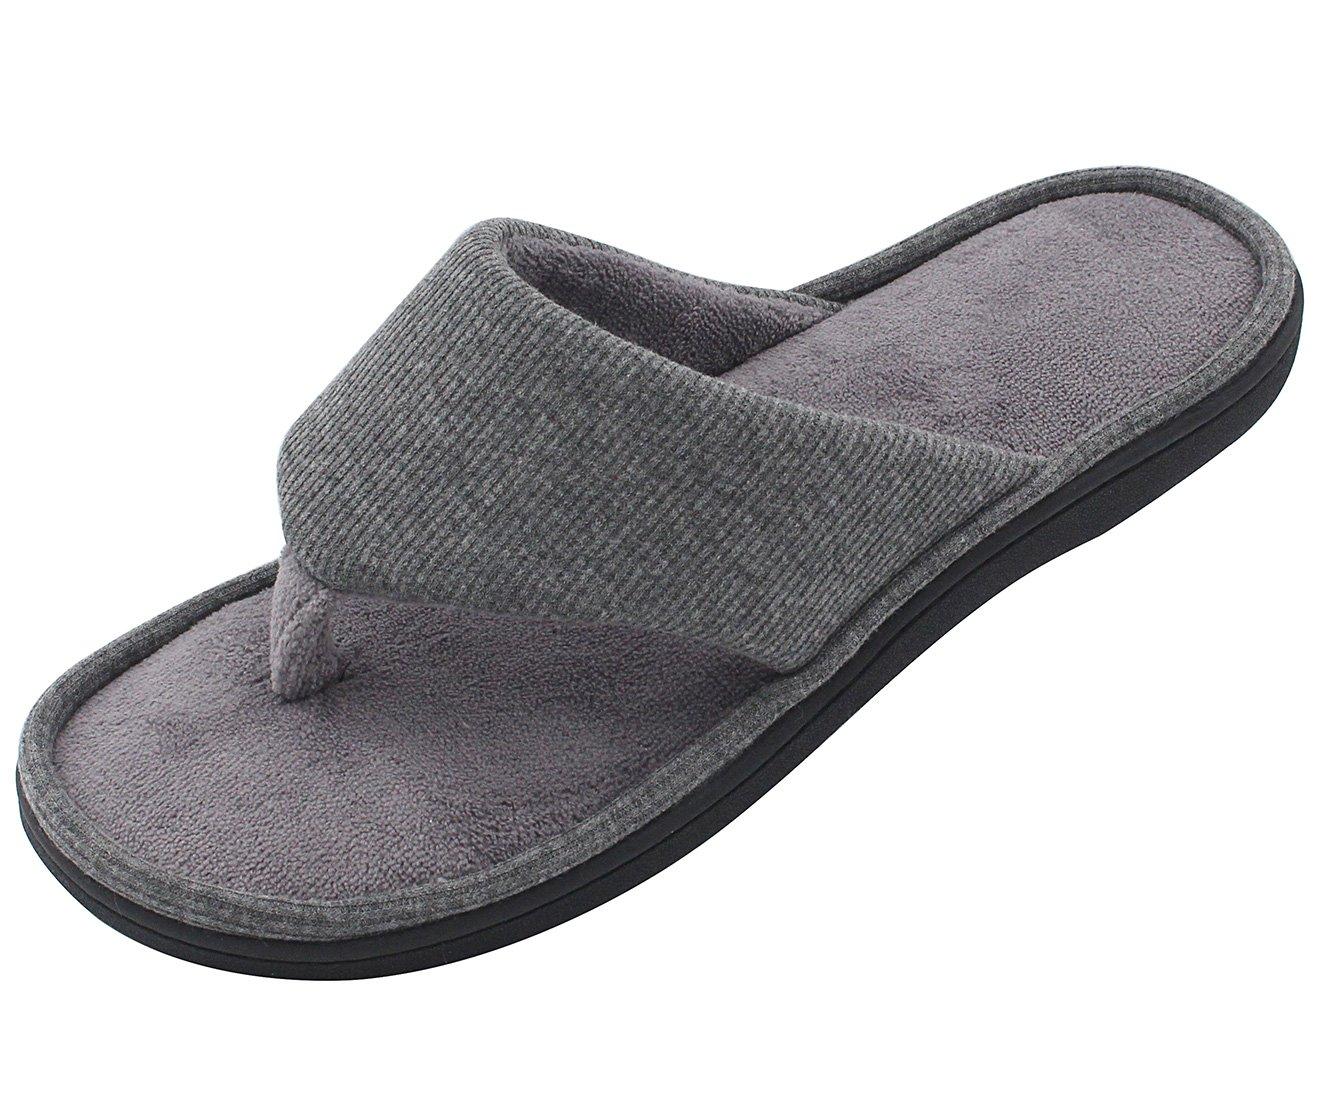 RockDove Memory Foam Men's Flip Flop House Slippers, Spring Summer Open Toe Thong Sandals w/ Indoor Outdoor Shoe Sole, Dove Gray, 13-14 D(M) US